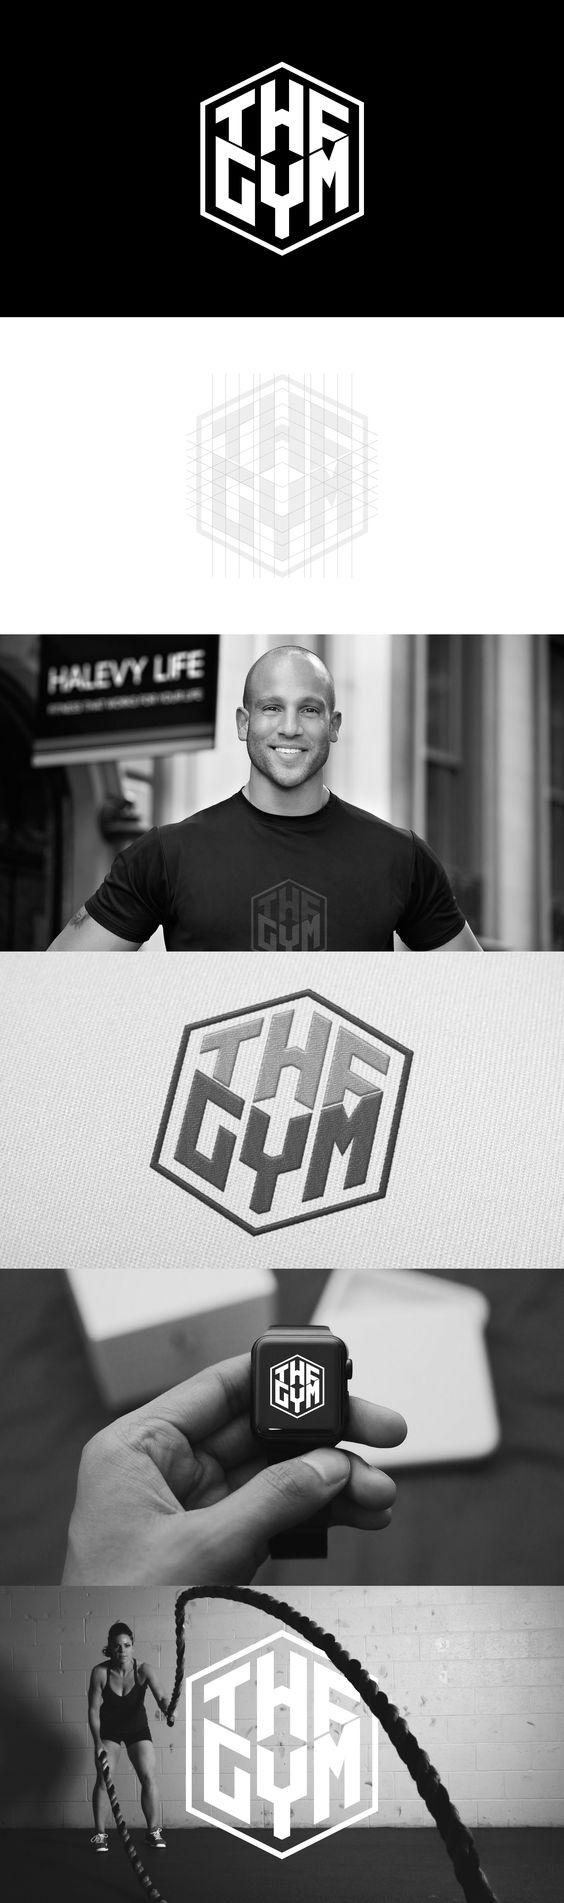 The Gym Logo Designed by Ricky Richards www.brandedbyrick.com